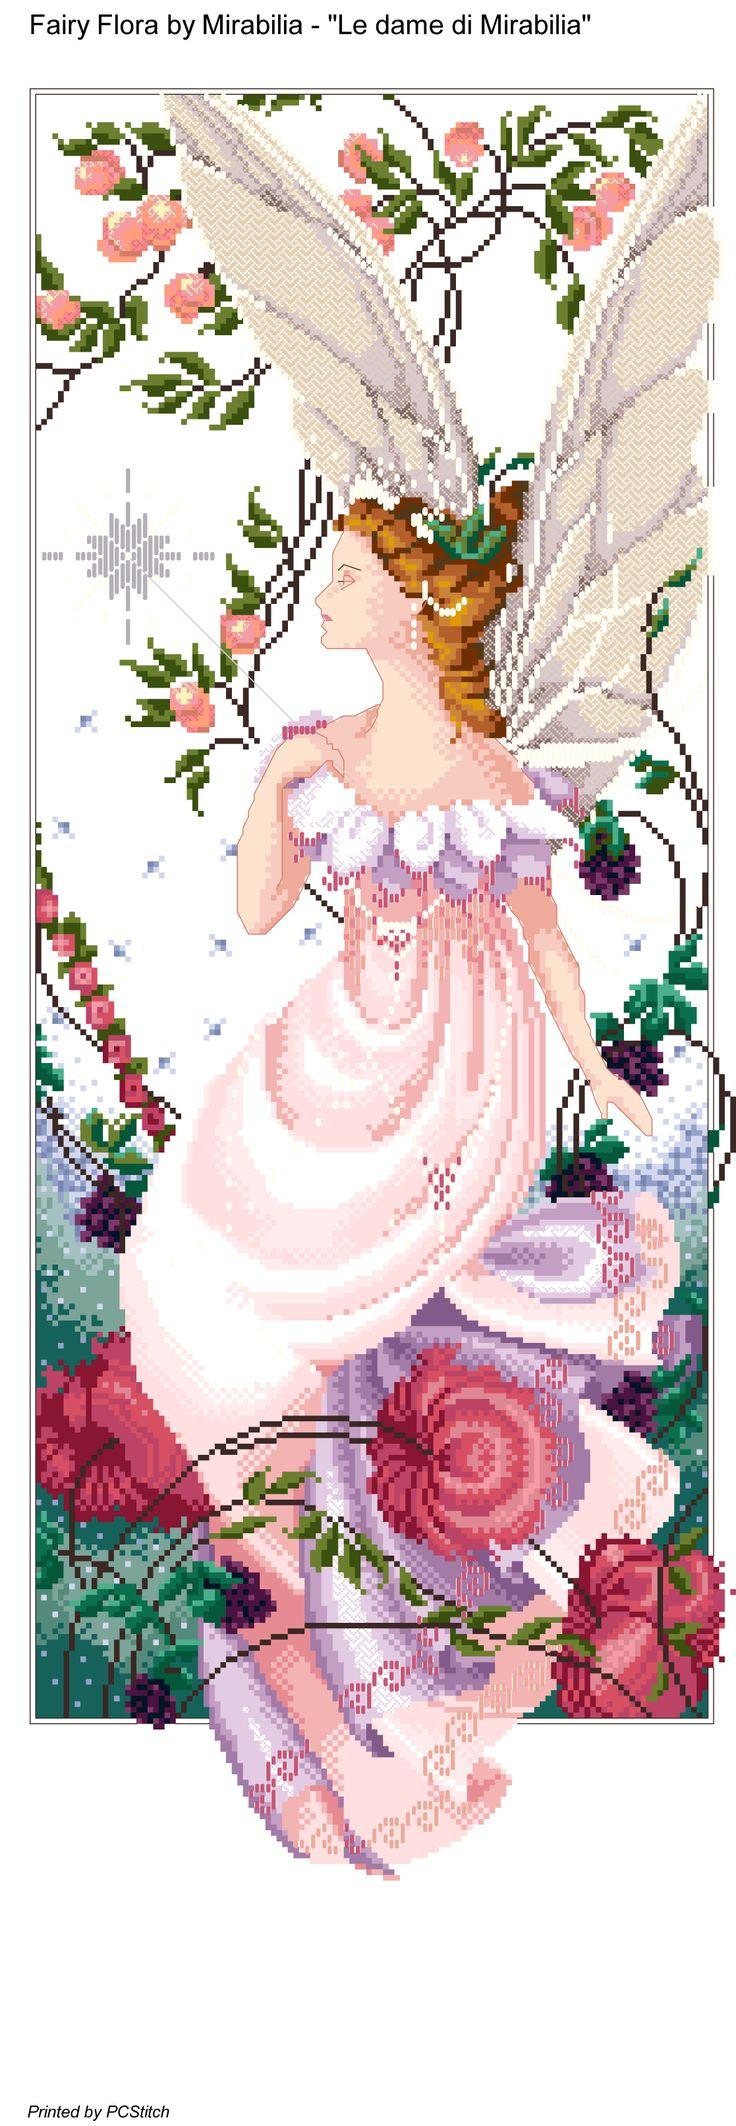 Fairy Flora 1